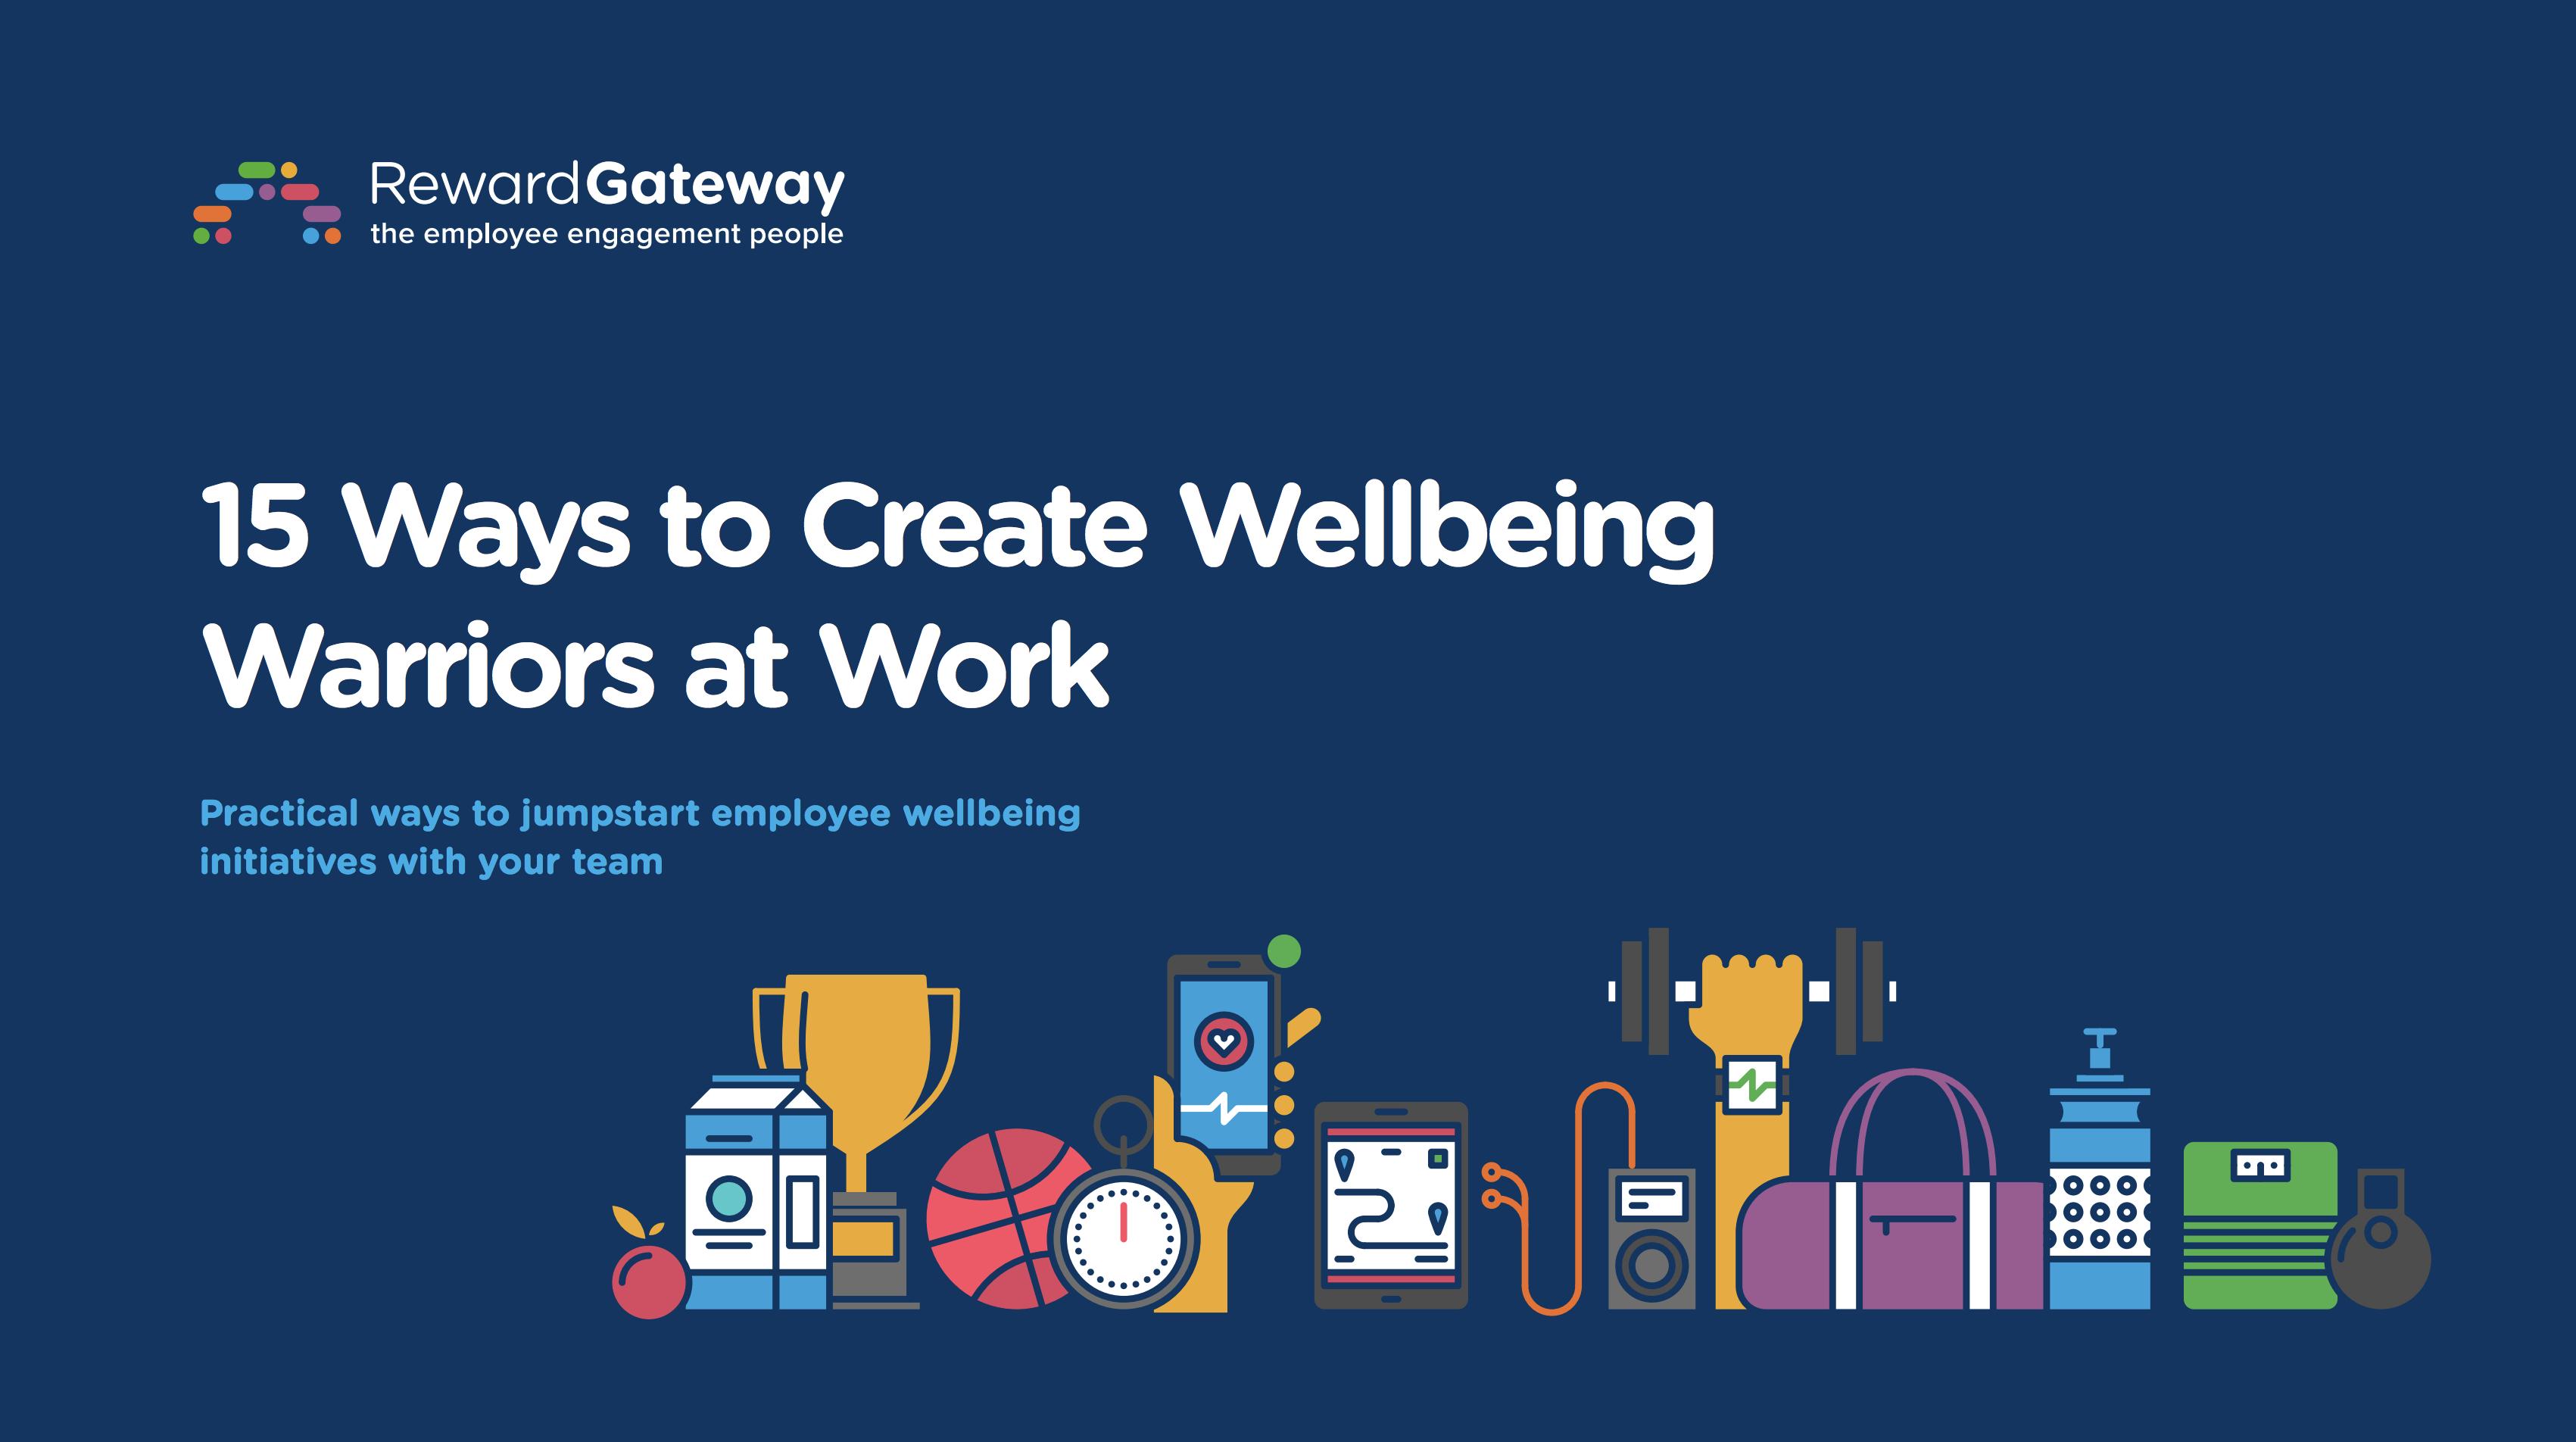 15 Ways to Create Wellbeing Warriors at Work